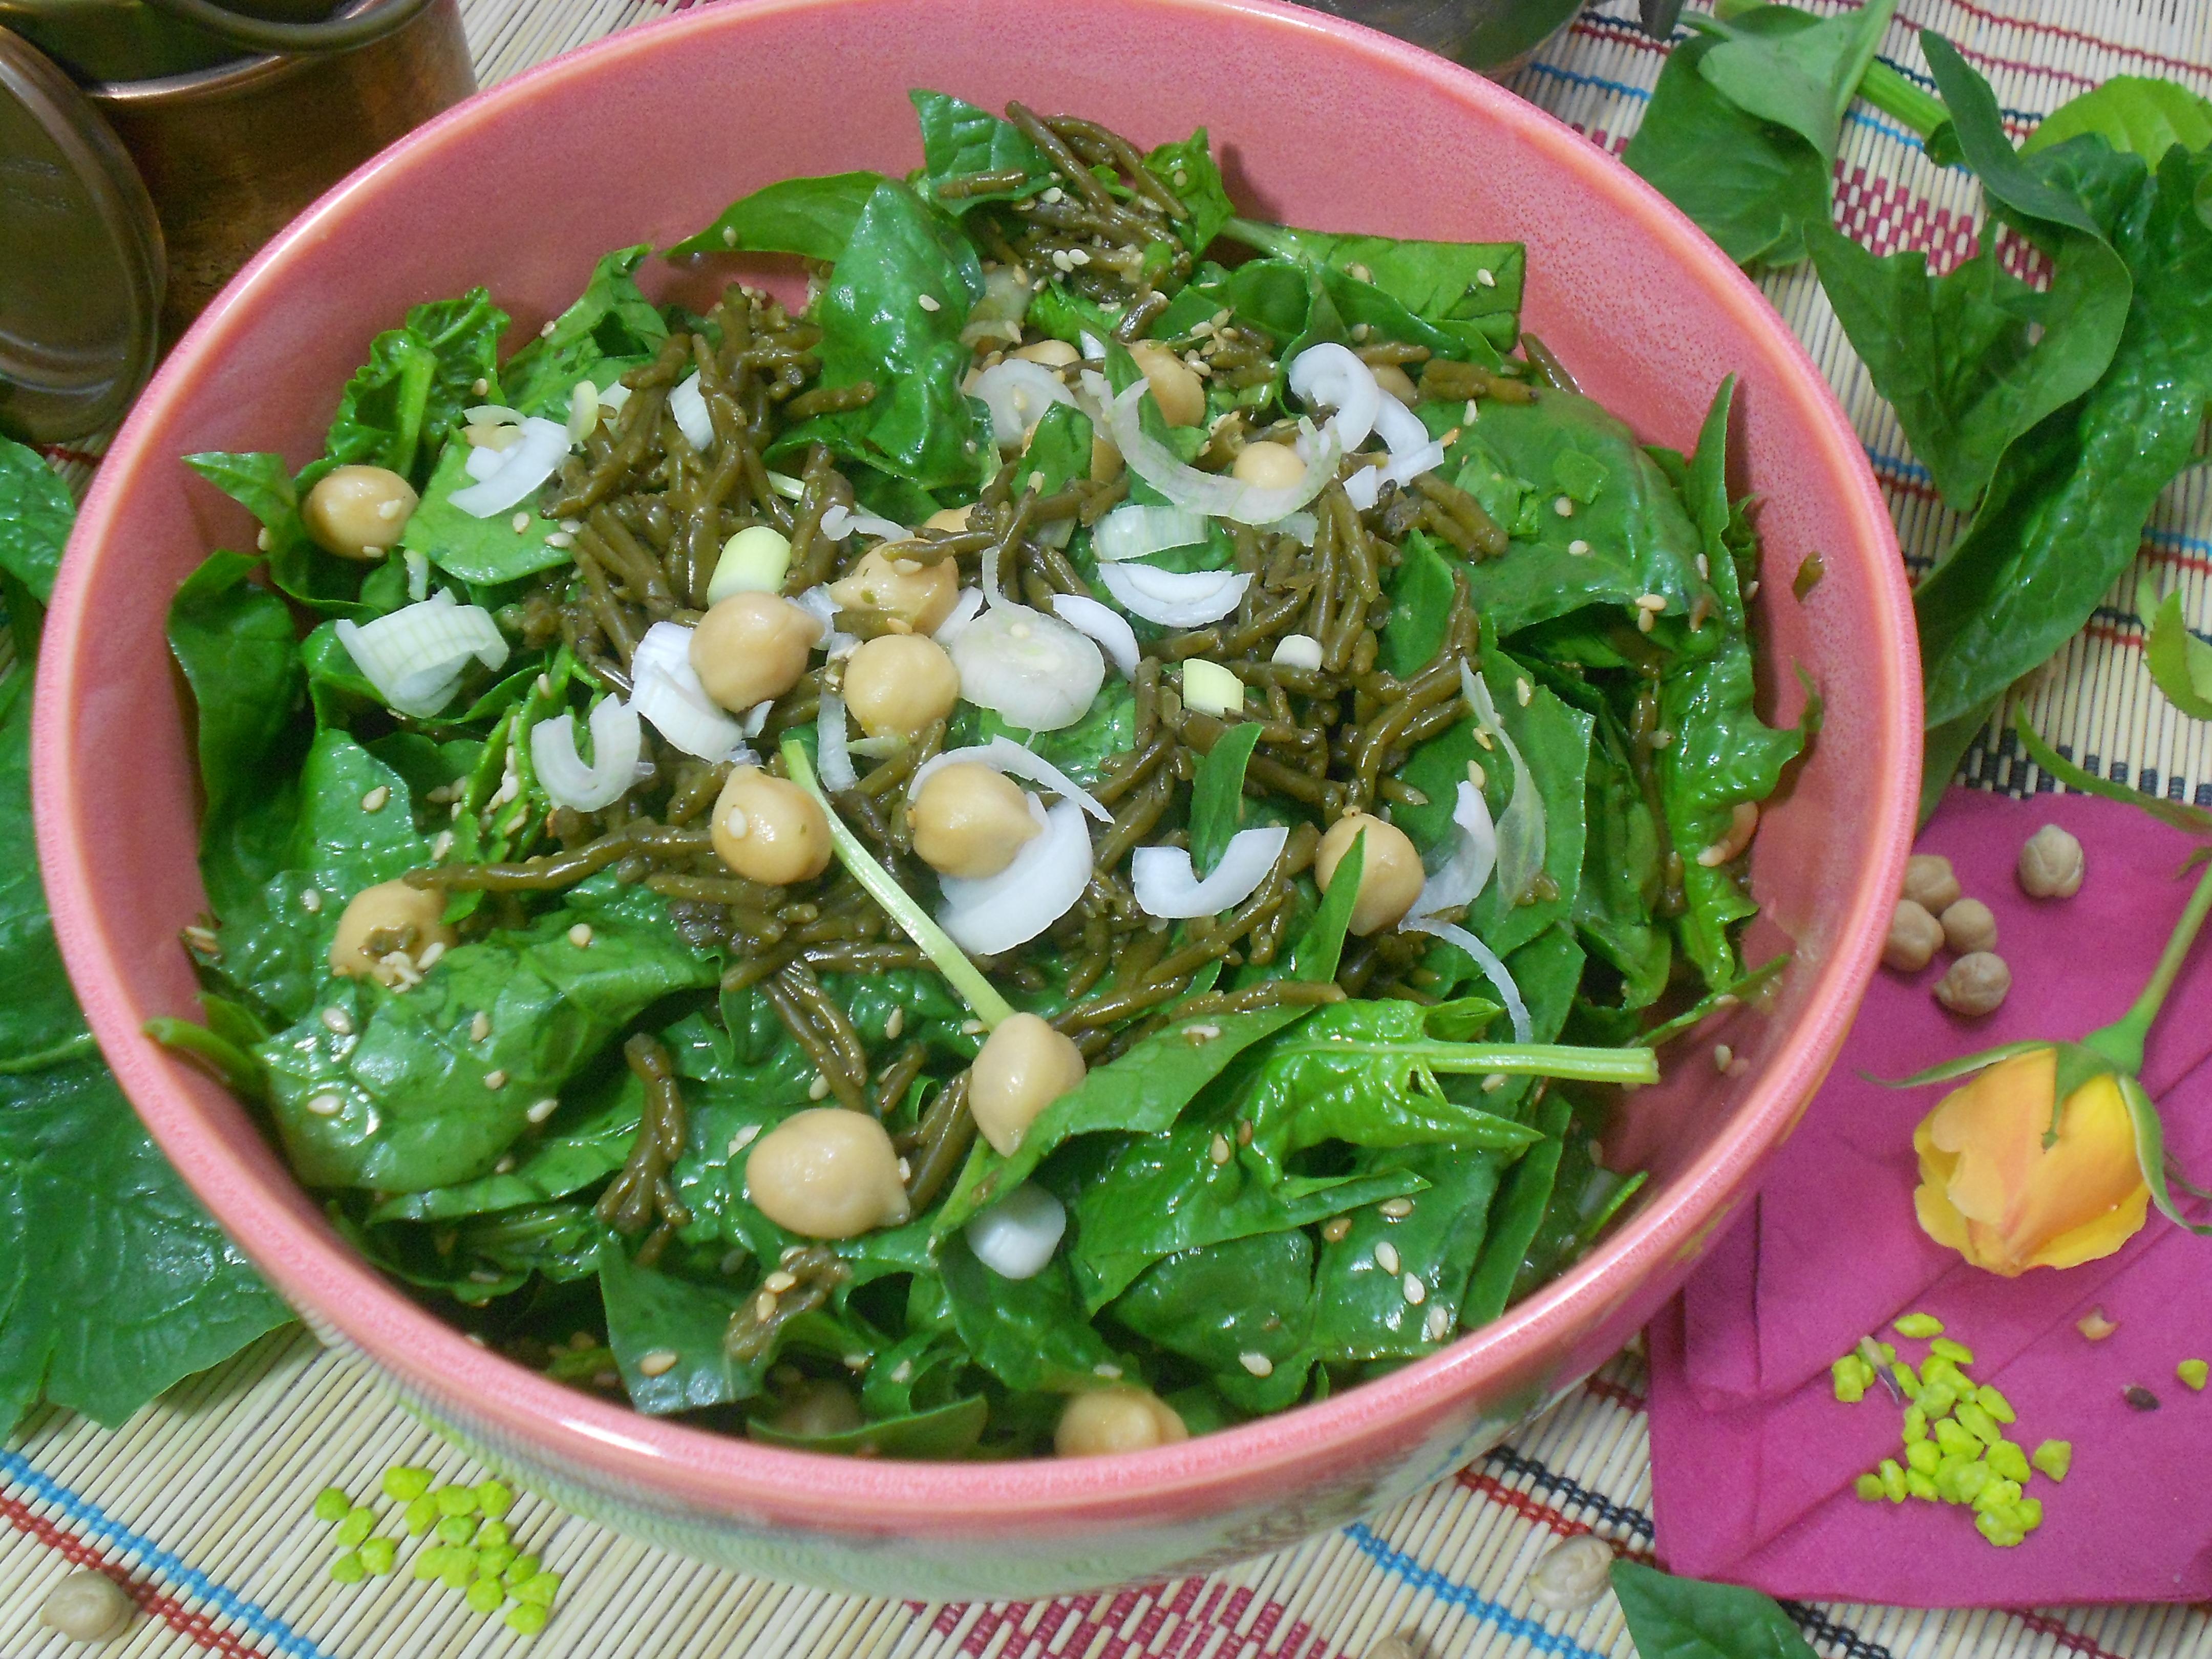 salade riches en anti oxydants